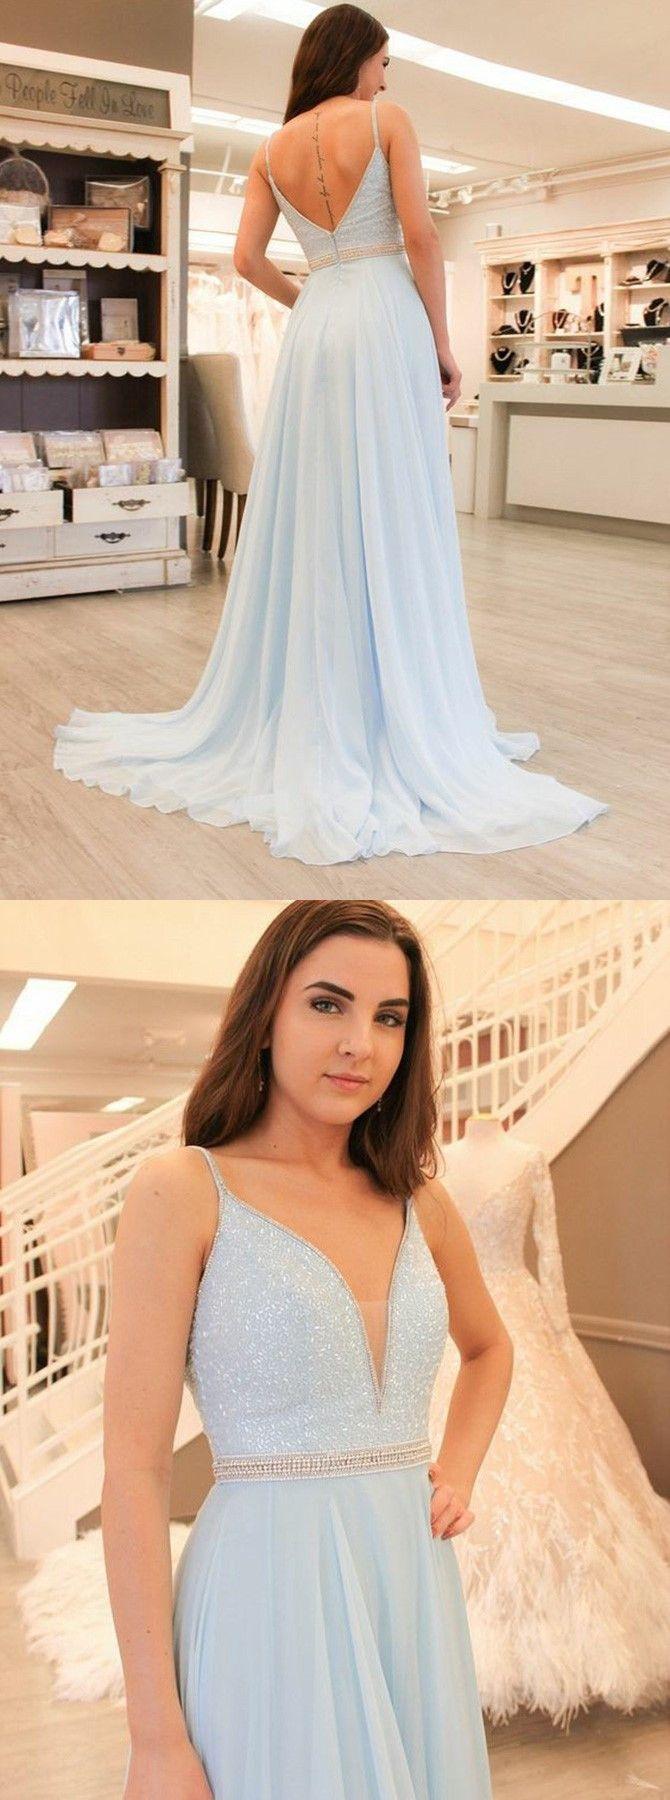 Aline vneck light blue chiffon prom dress with beading in